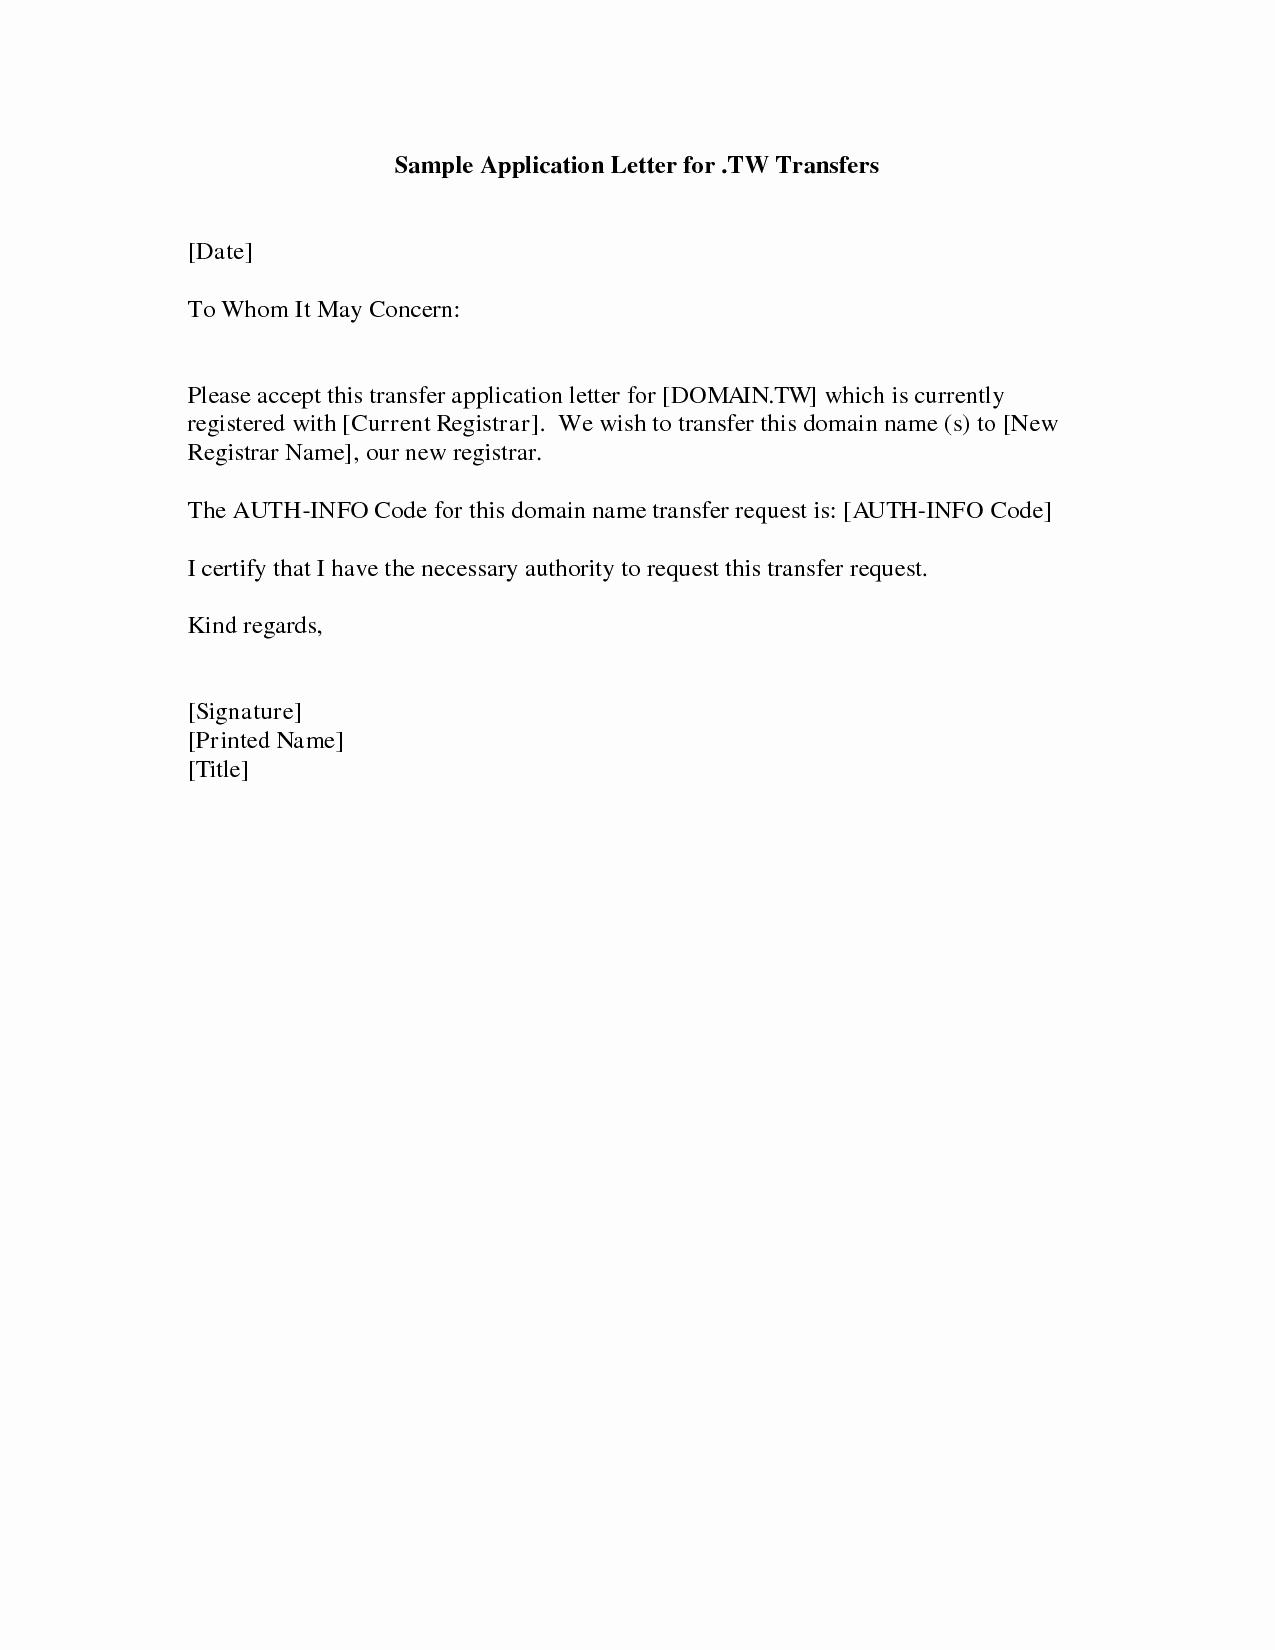 Simple Cover Letter Sample Elegant Simple Application format